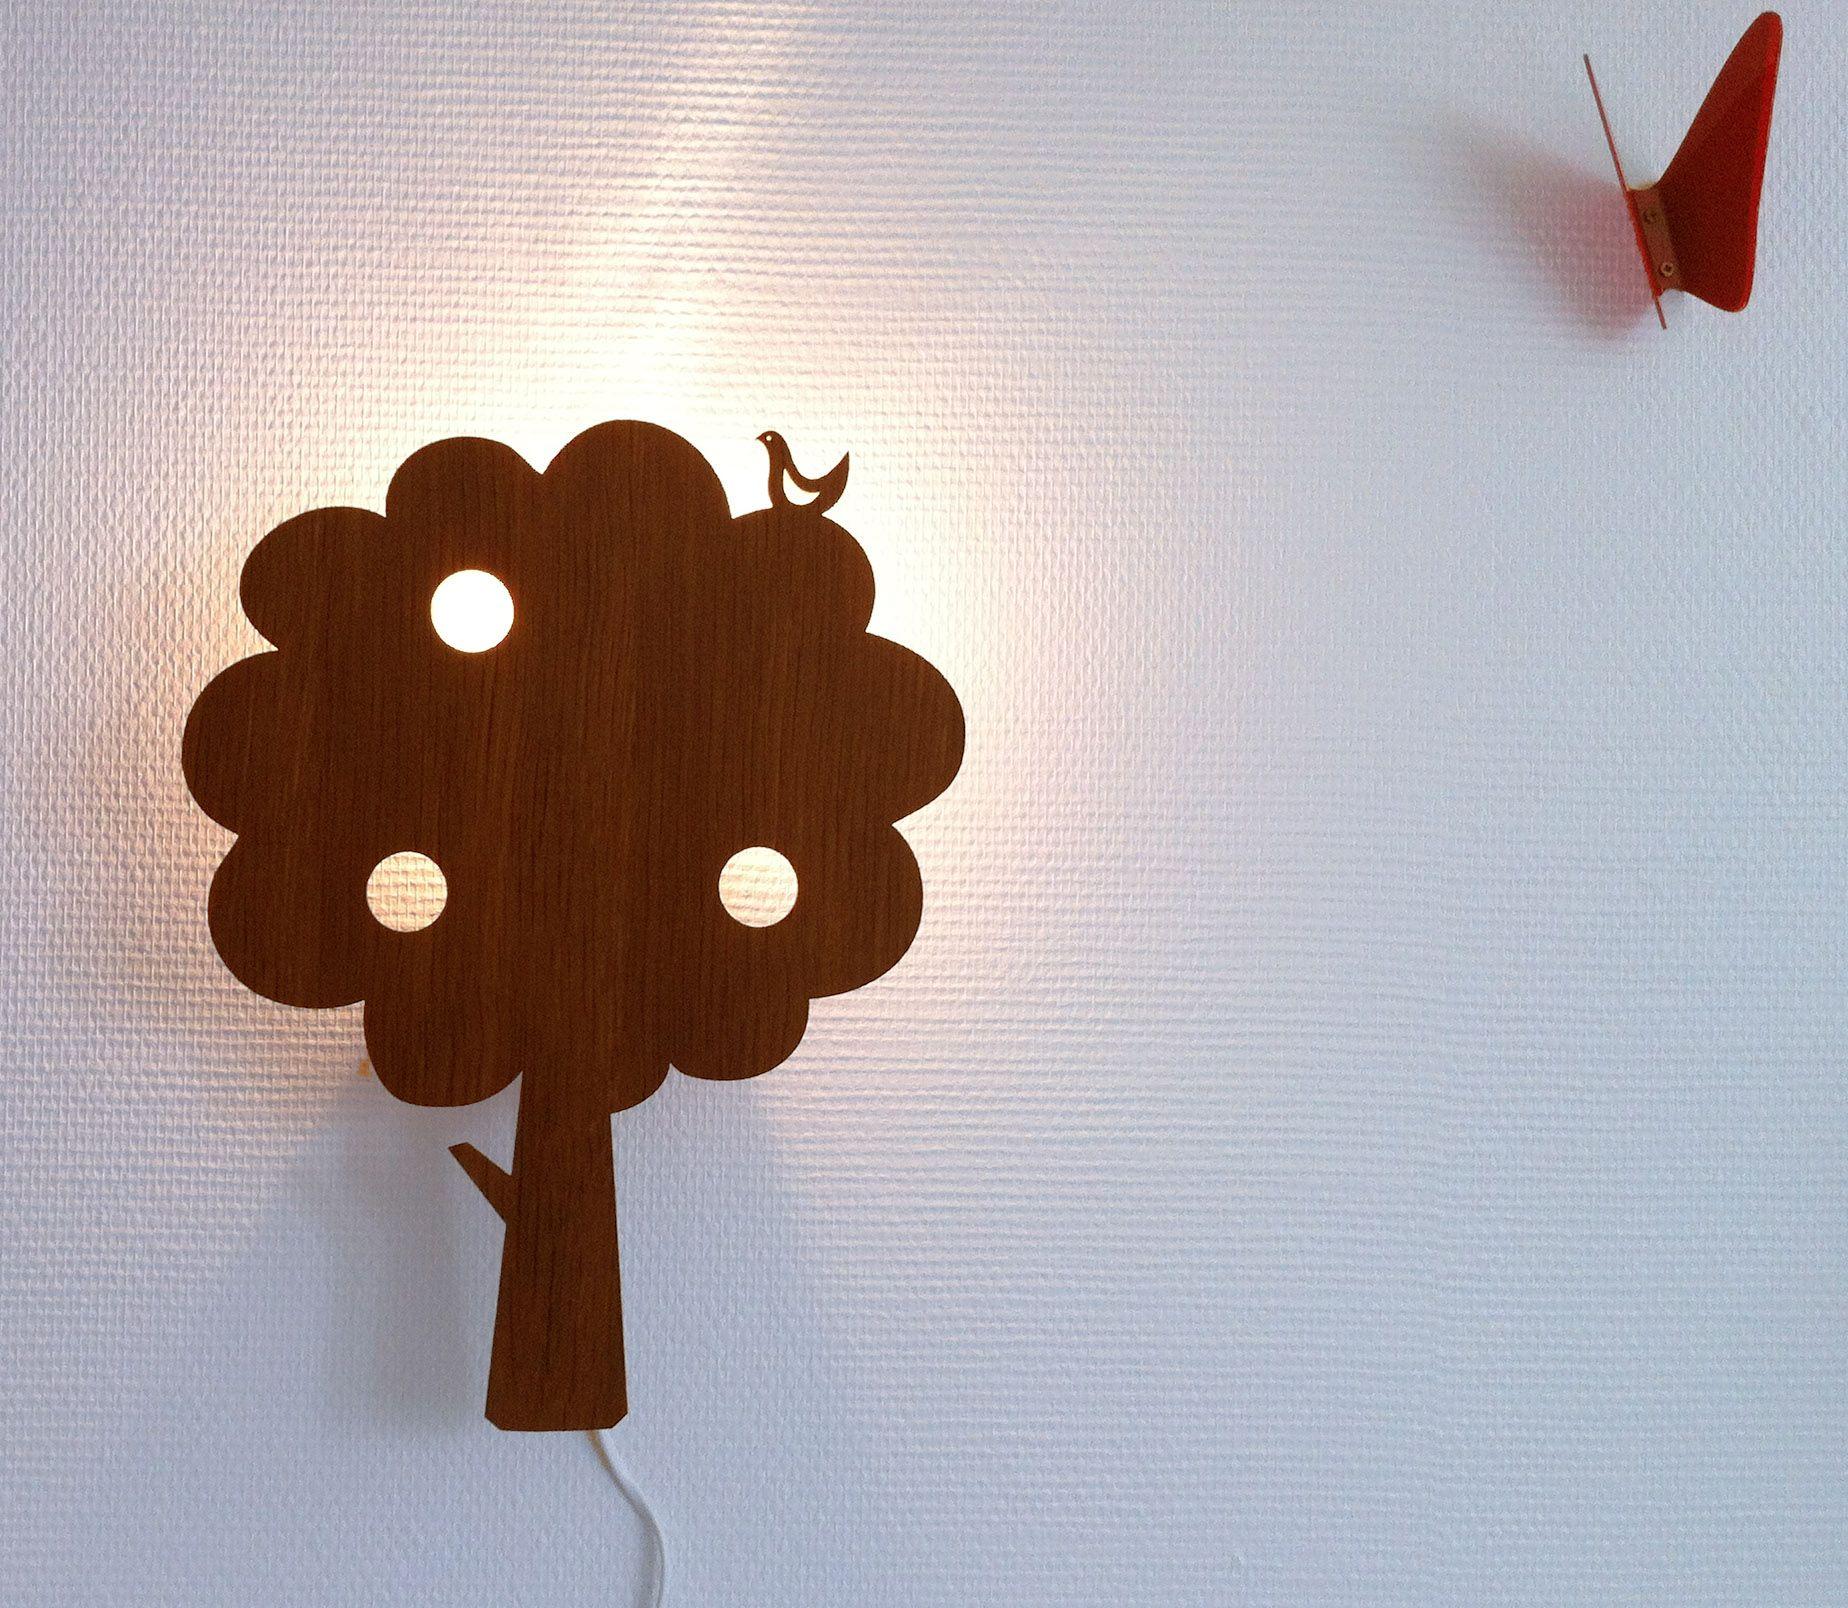 applique arbre deco chambre enfant pinterest deco chambre enfant deco chambre et appliques. Black Bedroom Furniture Sets. Home Design Ideas